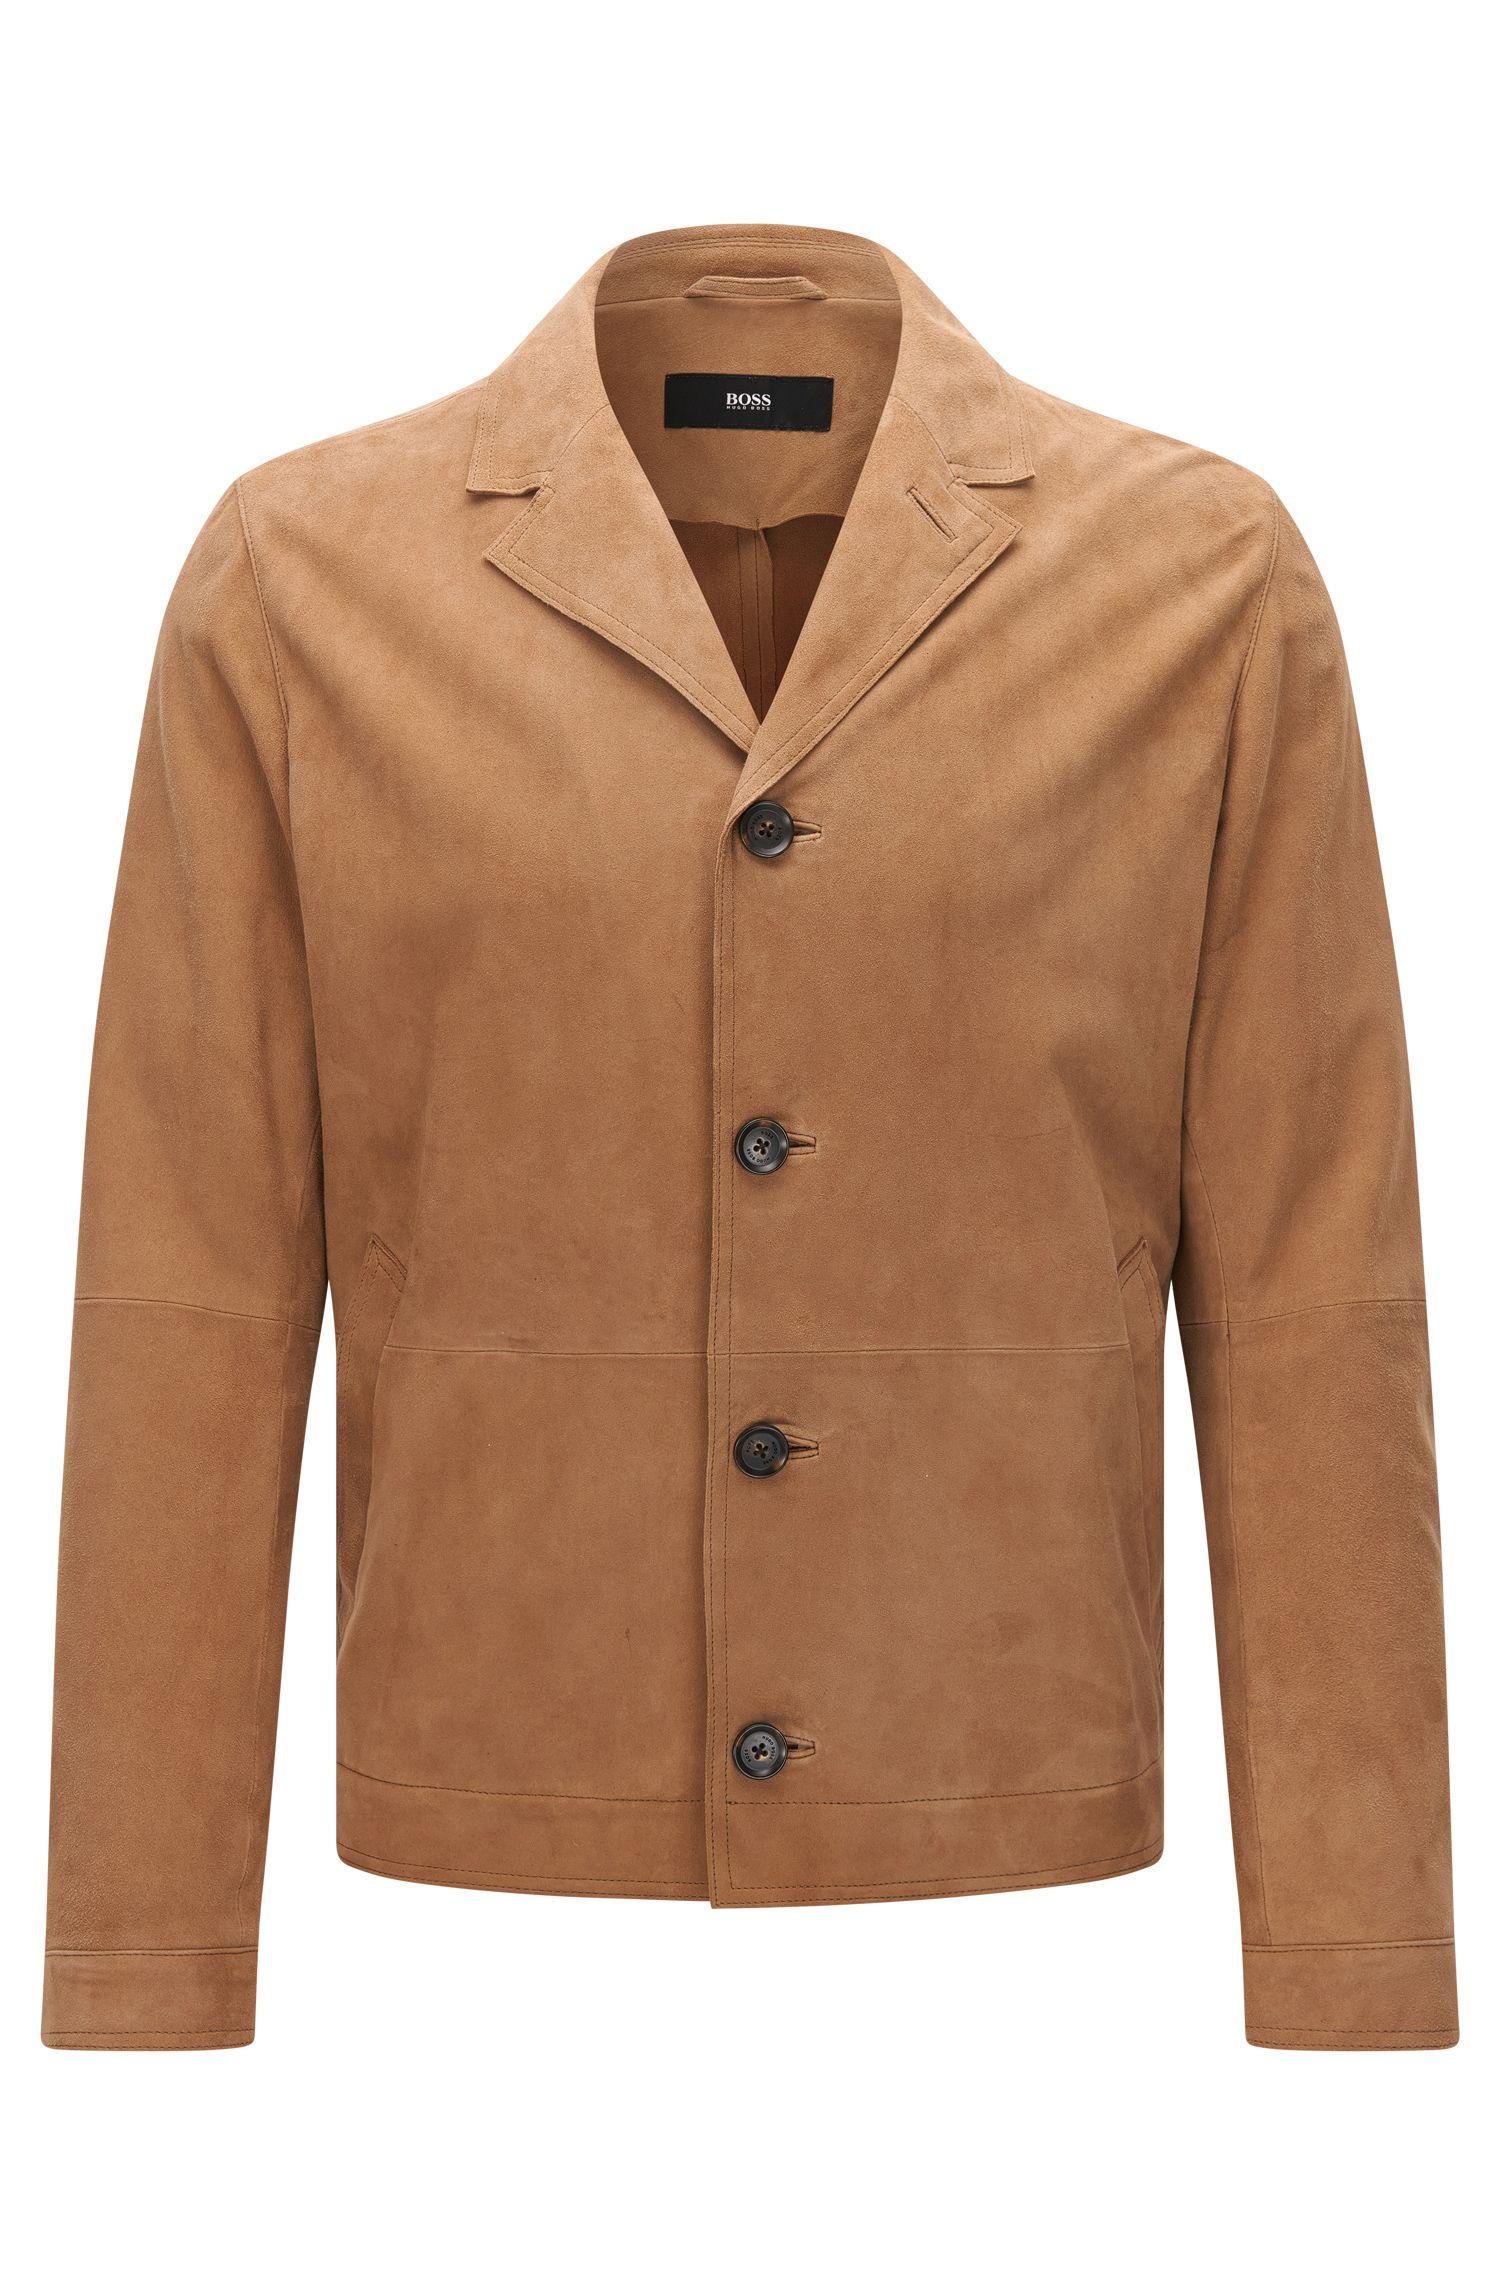 'Avisto' | Regular Fit, Suede Jacket